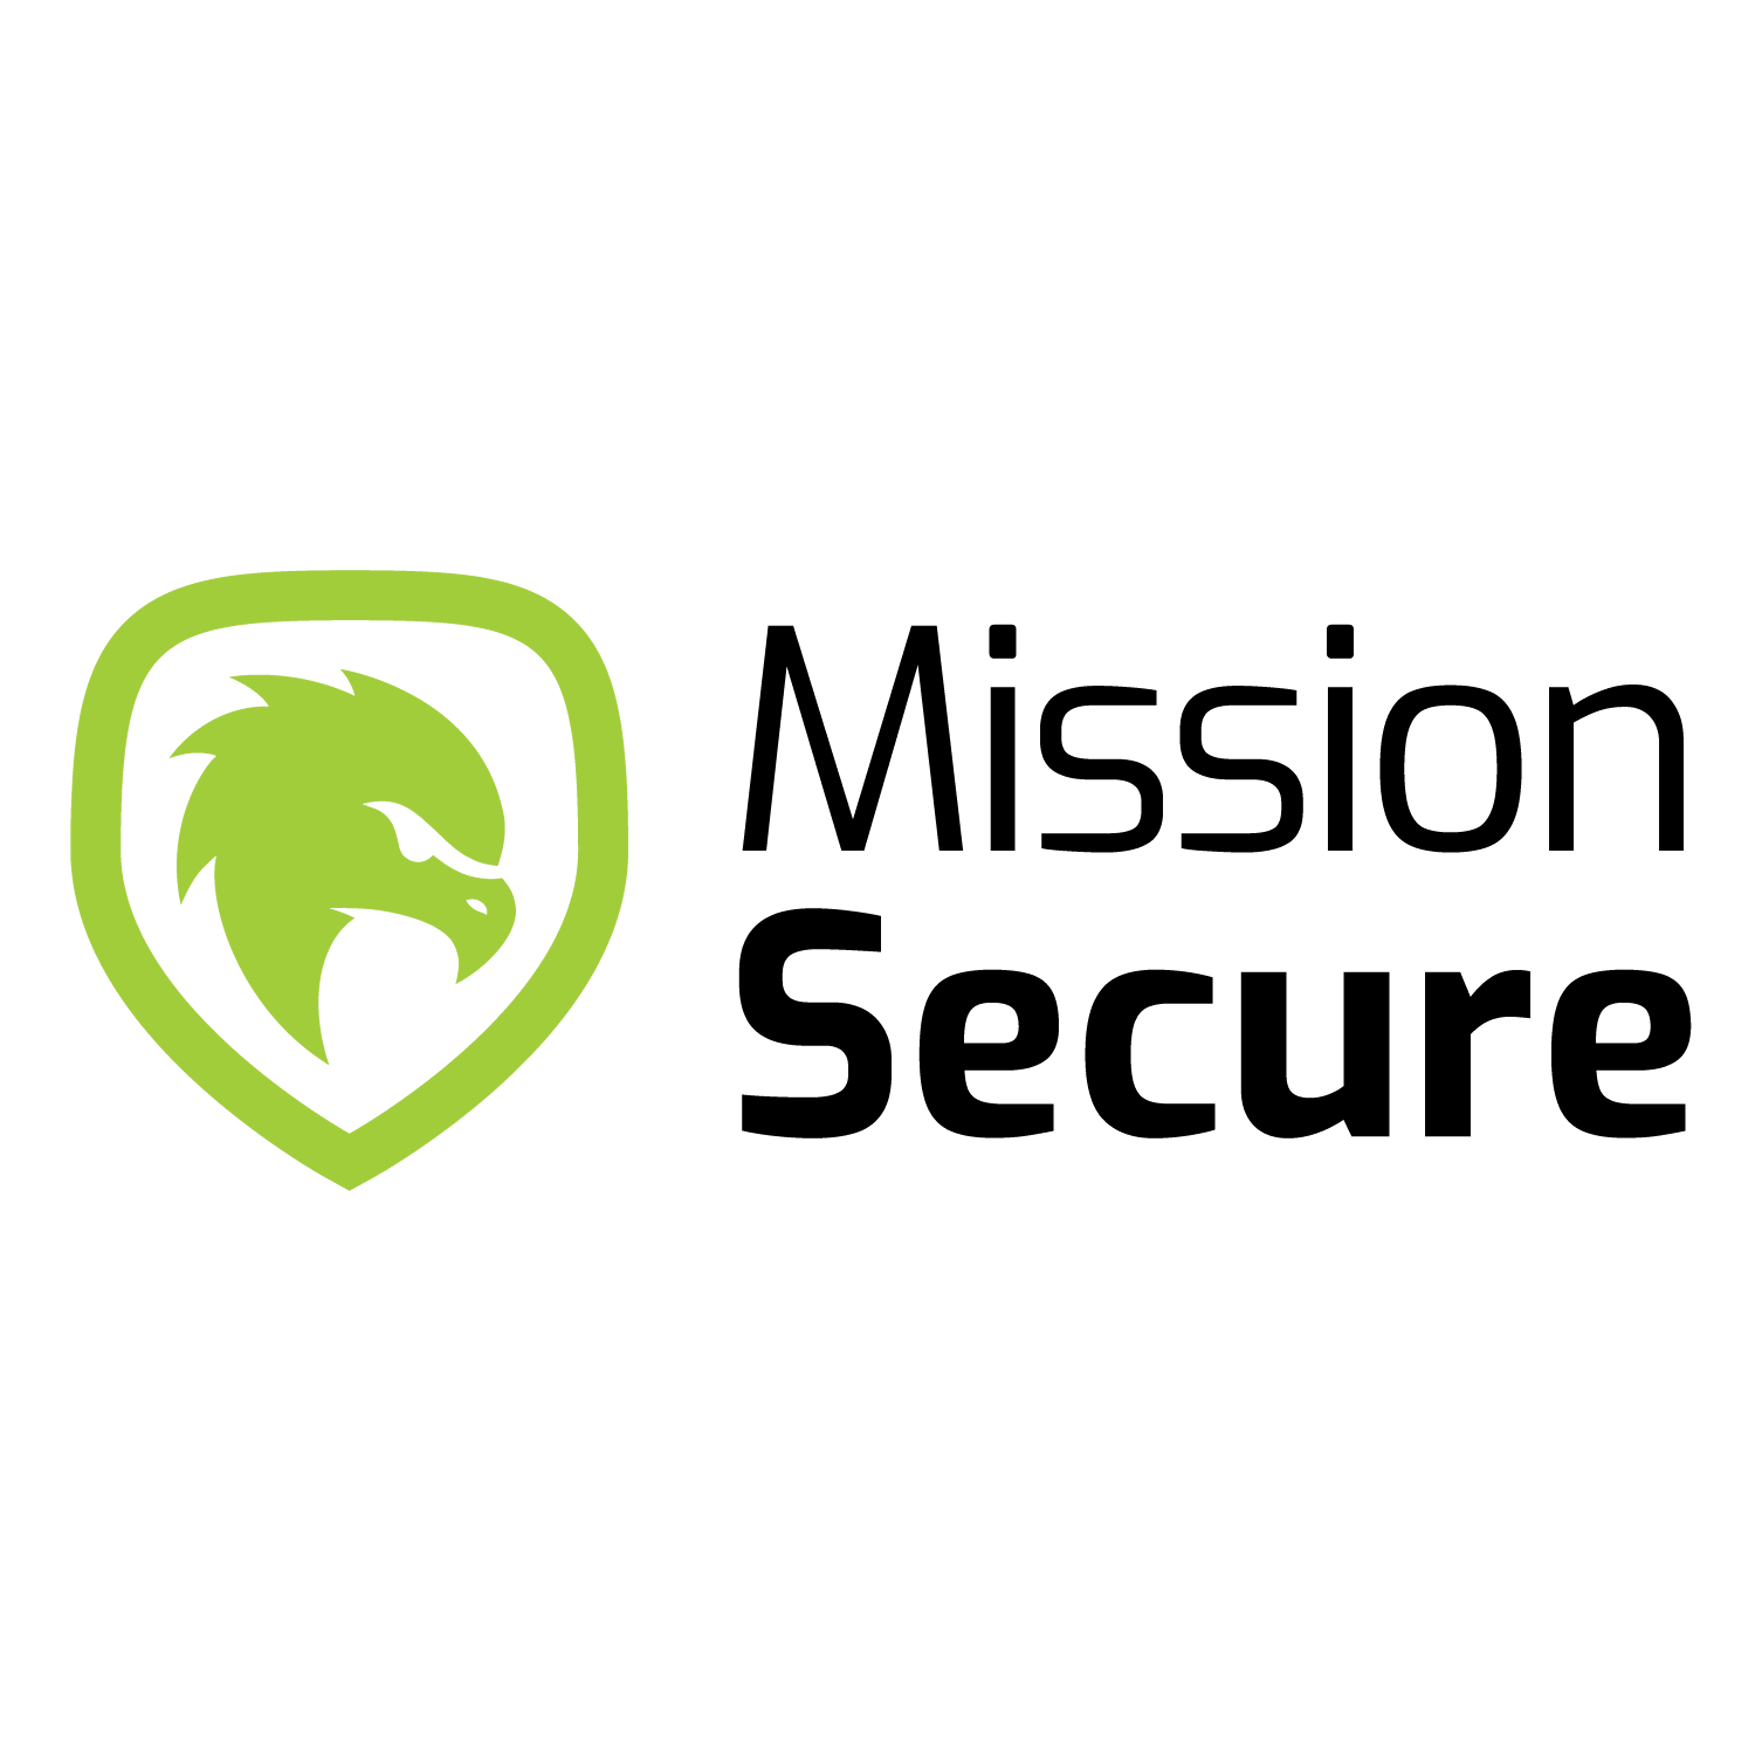 Mission Secure, Inc. logo